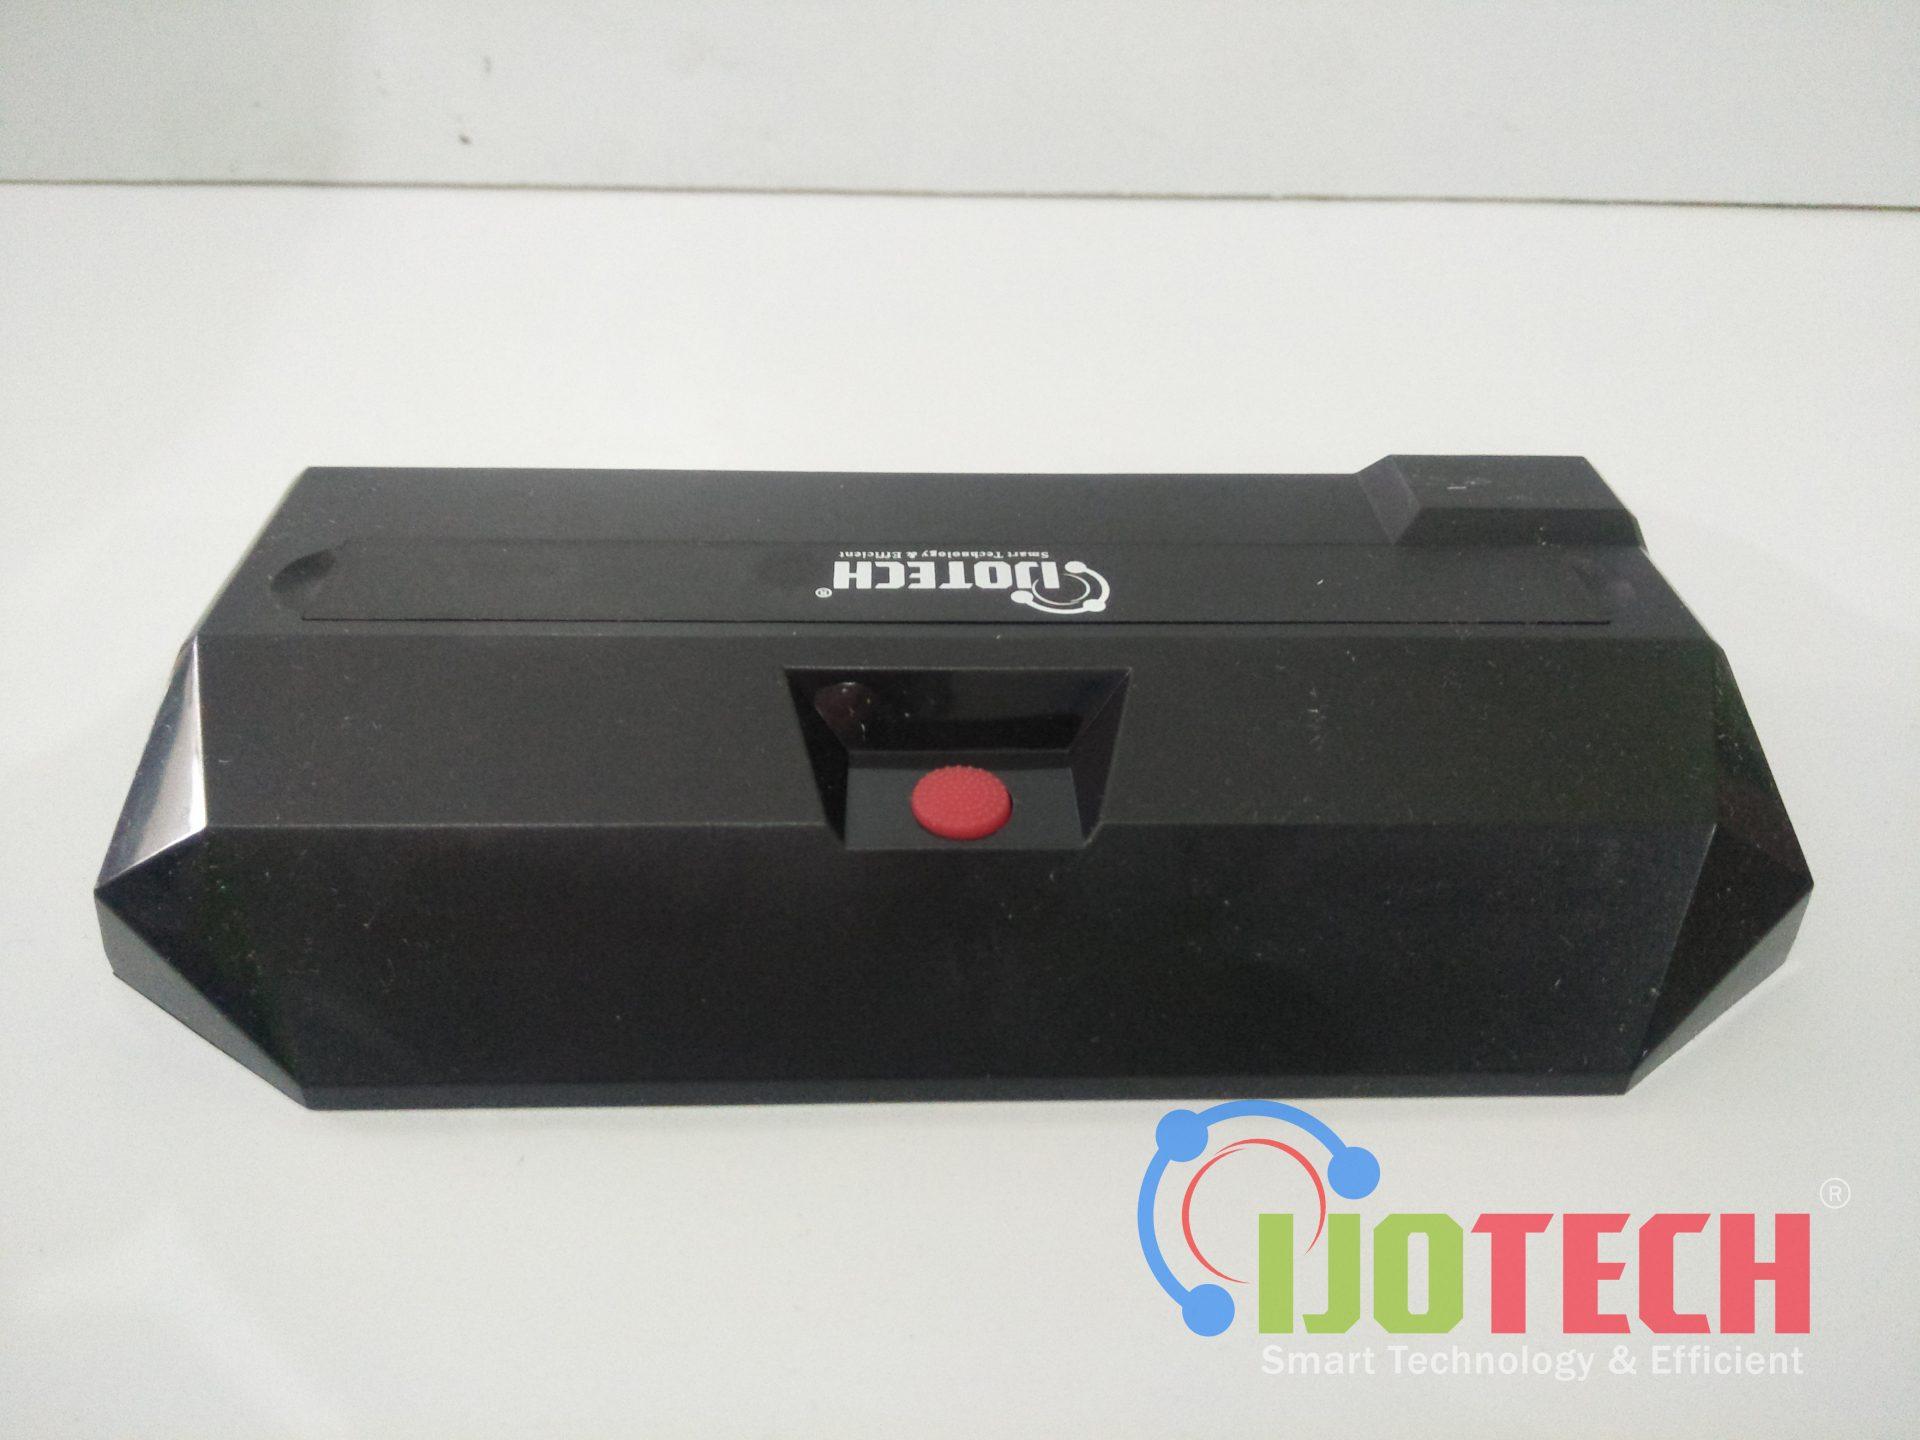 IJOTECH AGC 700N